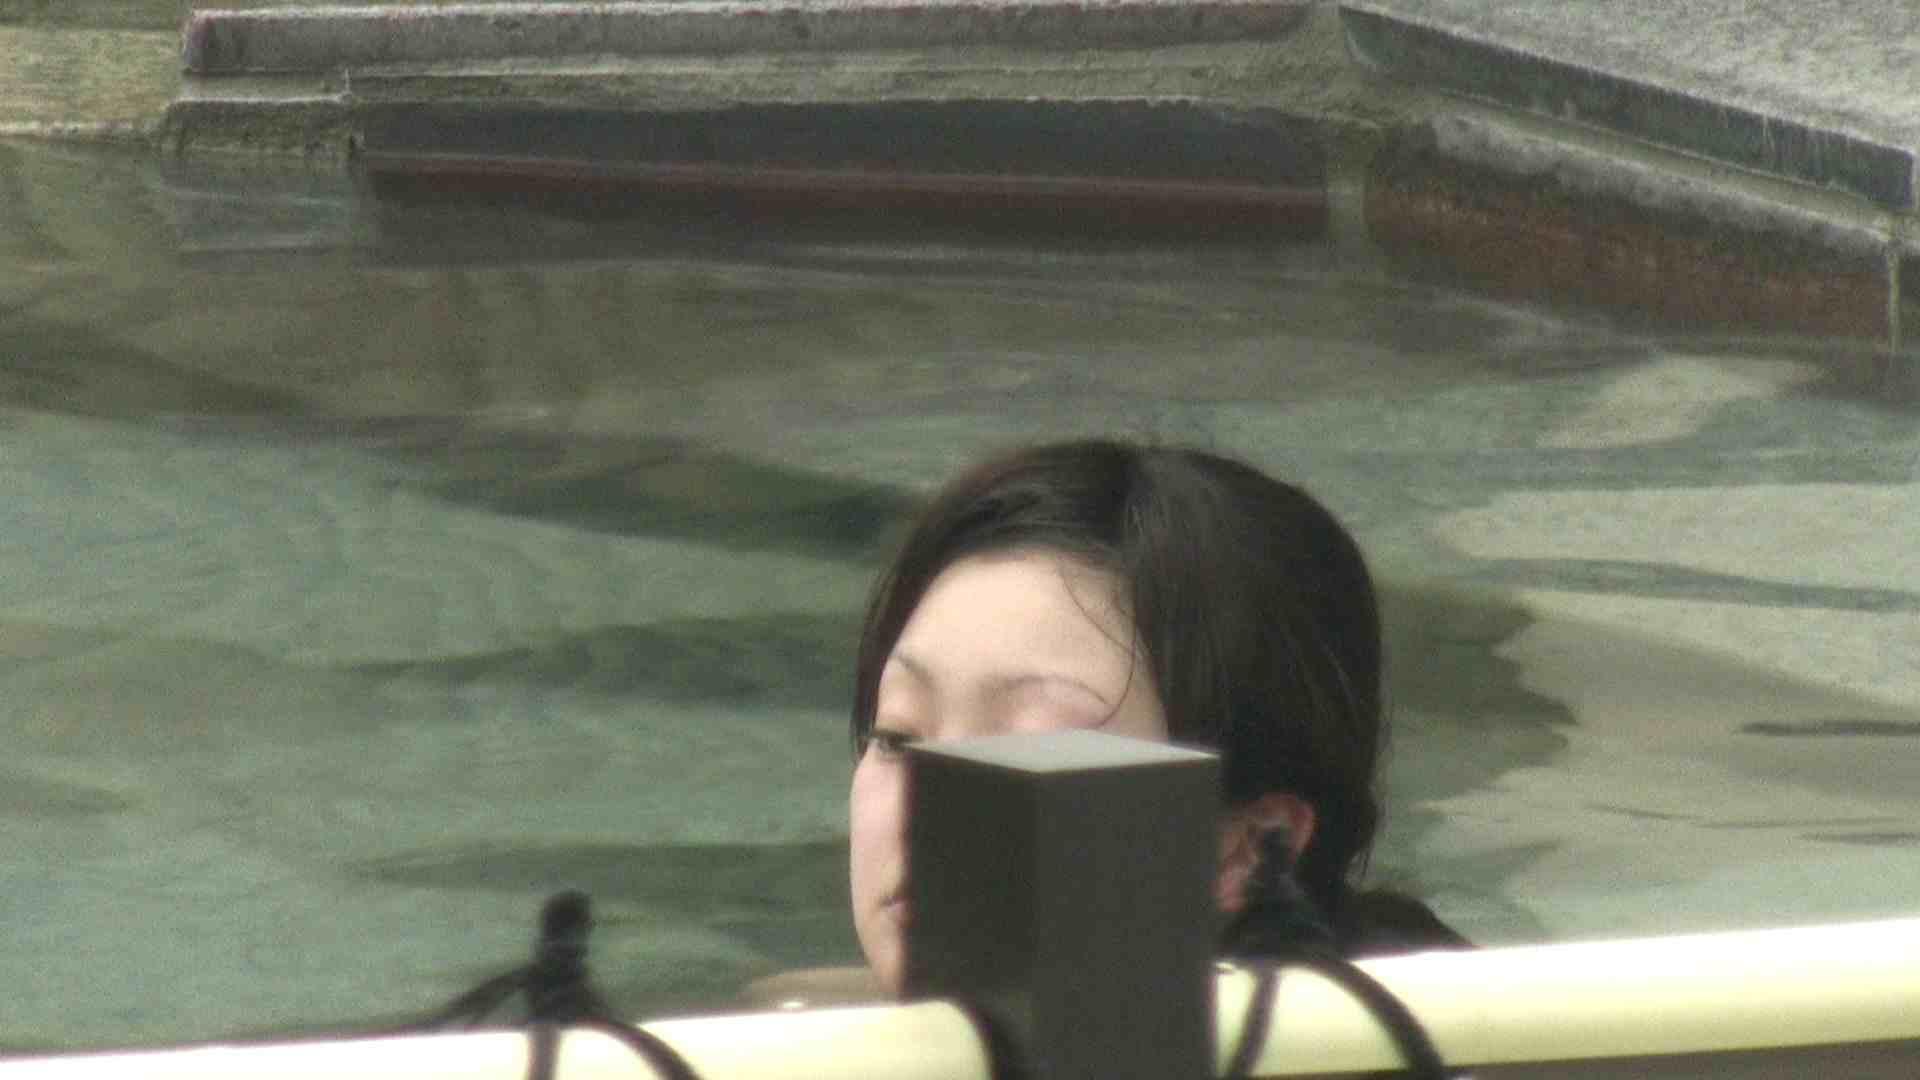 Aquaな露天風呂Vol.126 盗撮シリーズ   露天風呂編  103PIX 5